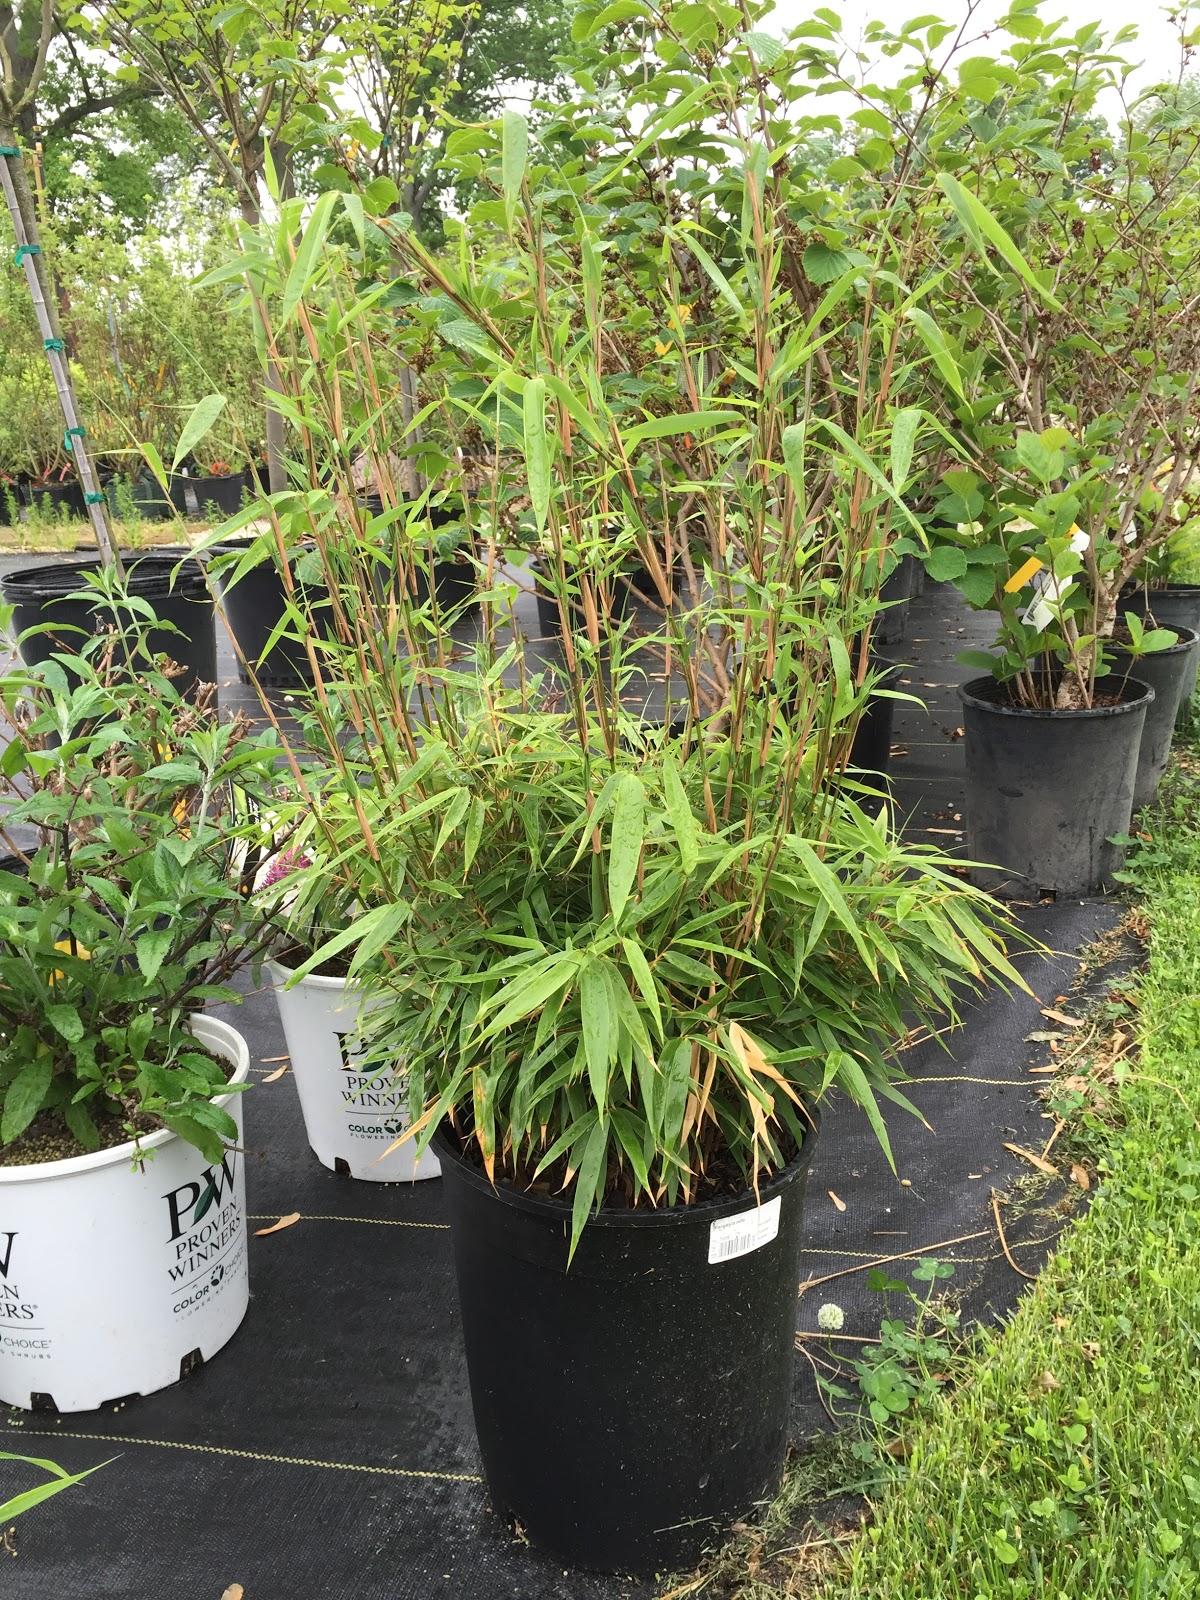 Green Panda Bamboo Bushy Growth and Tall Stalks [Backyard ...  Green Panda Bam...